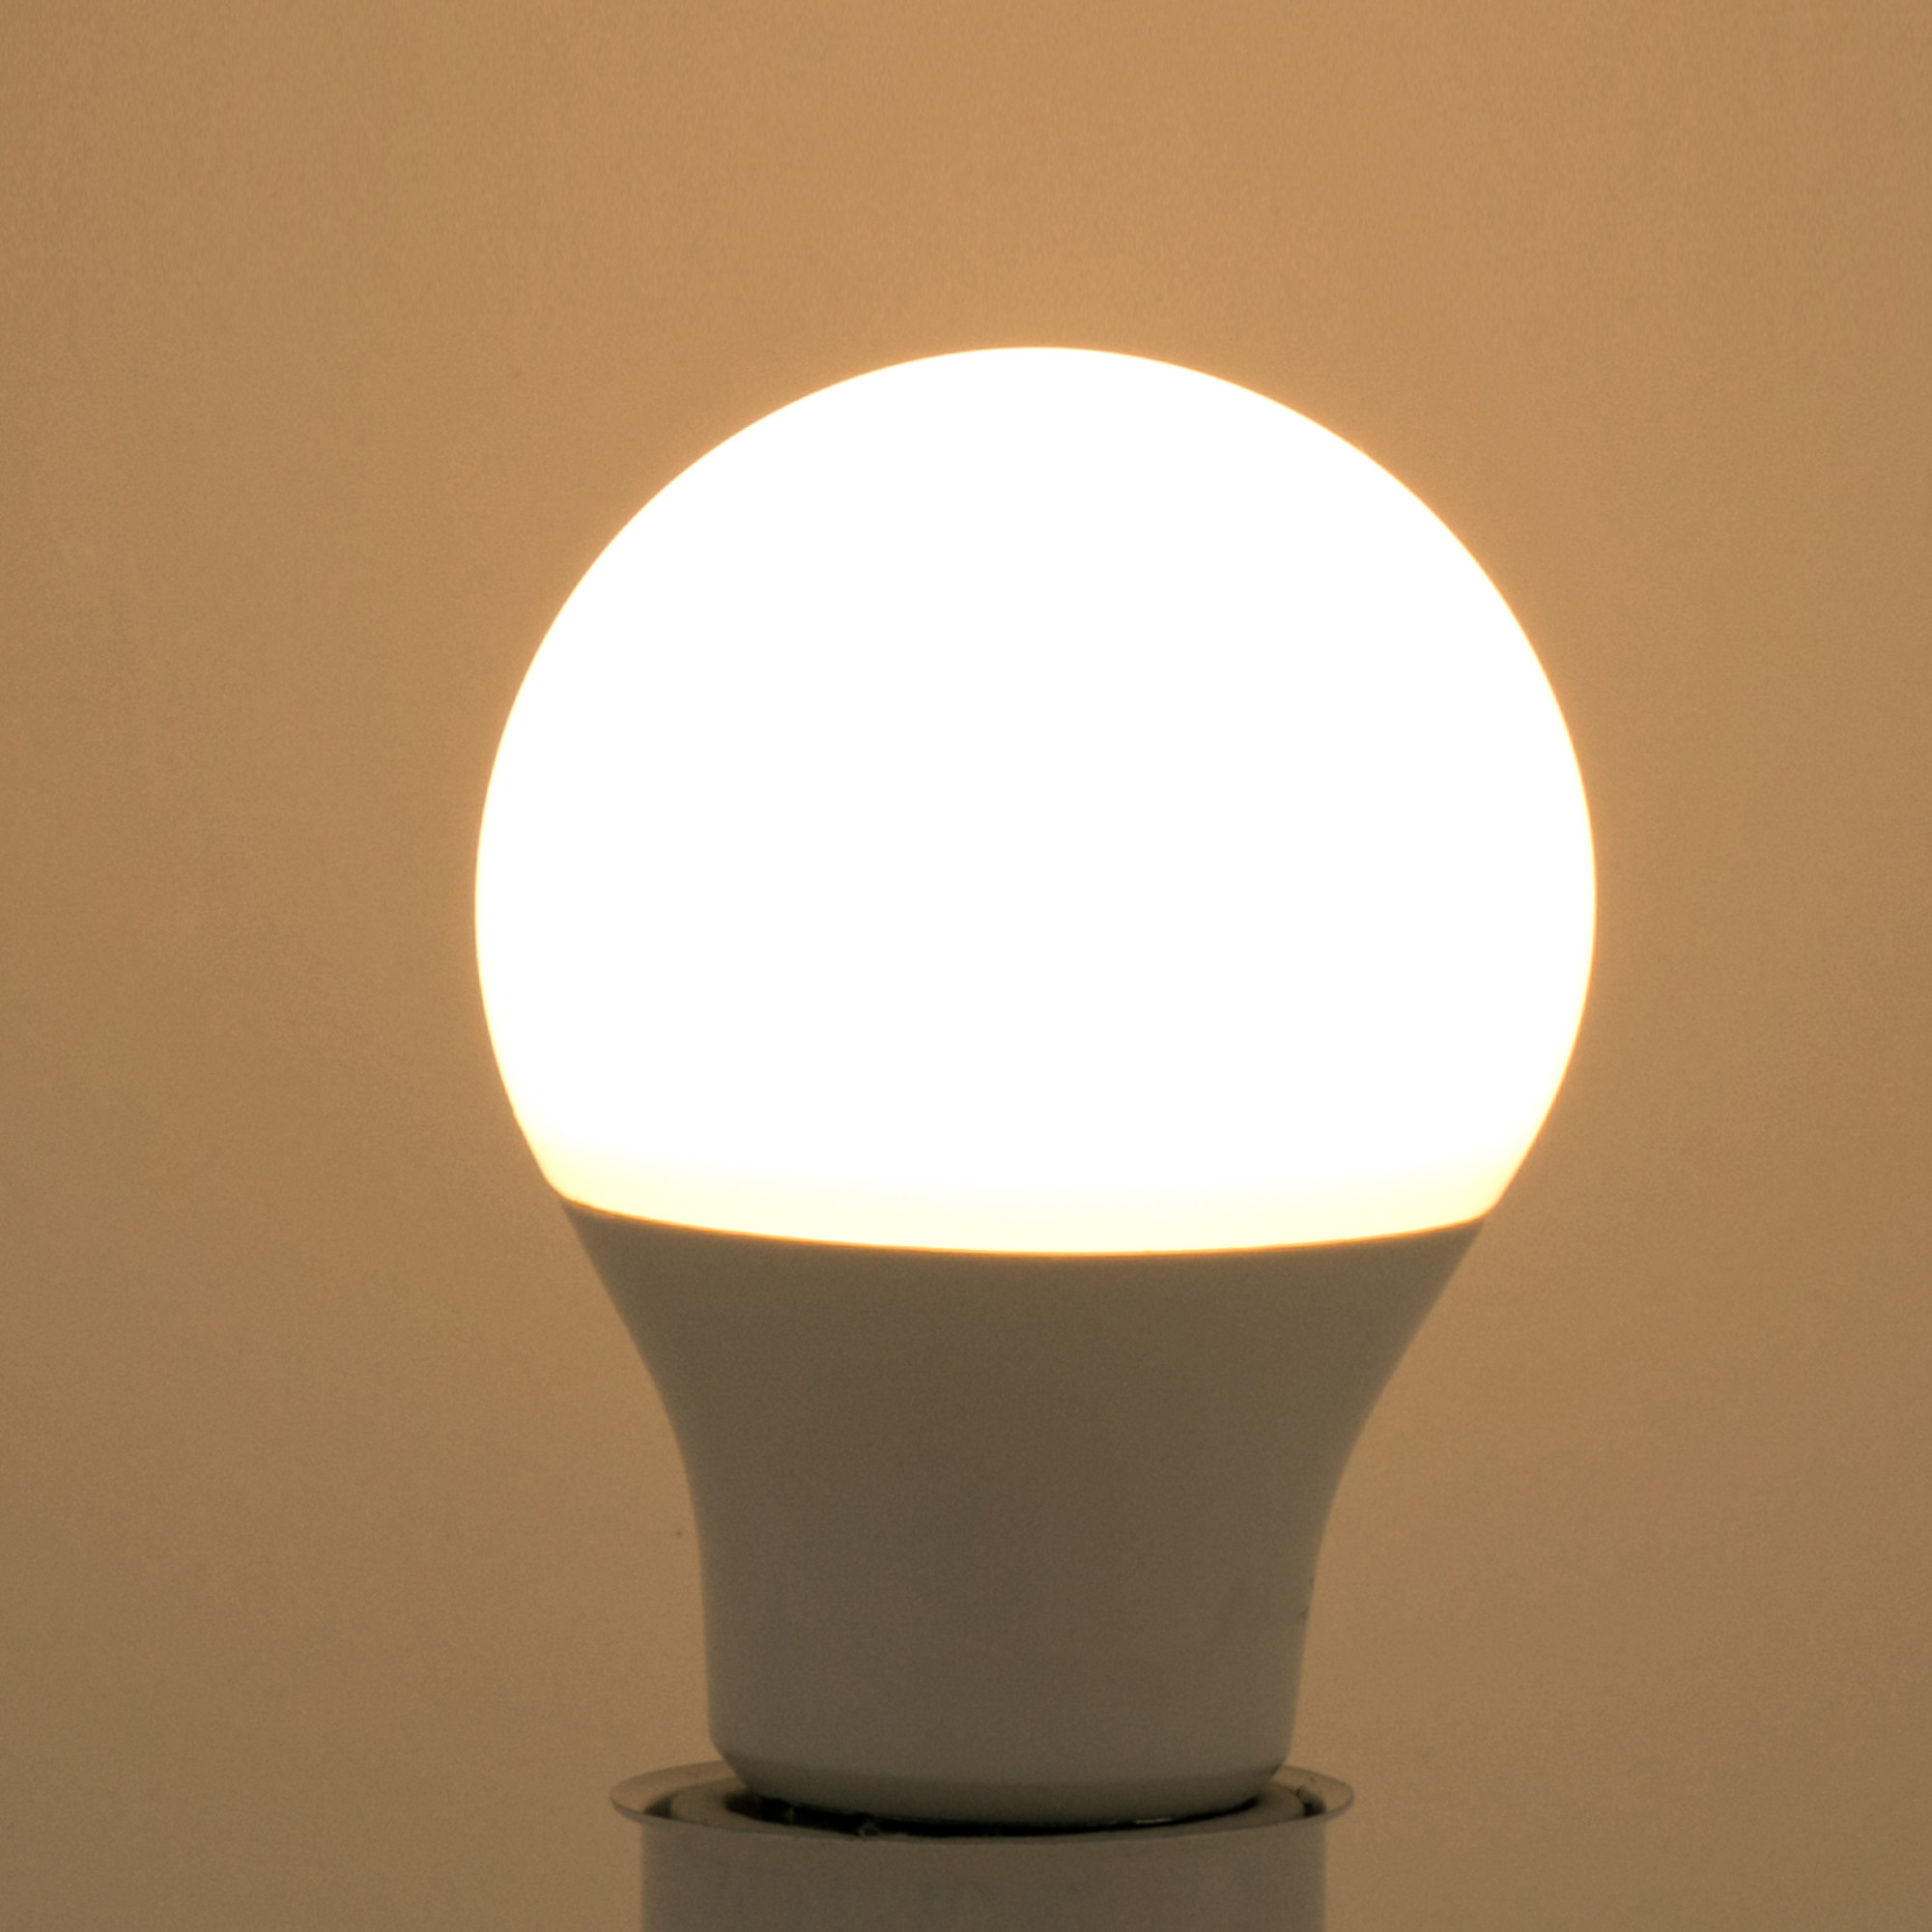 Лампа светодиодная Lexman E27 10.5 Вт 1055 Лм свет тёплый